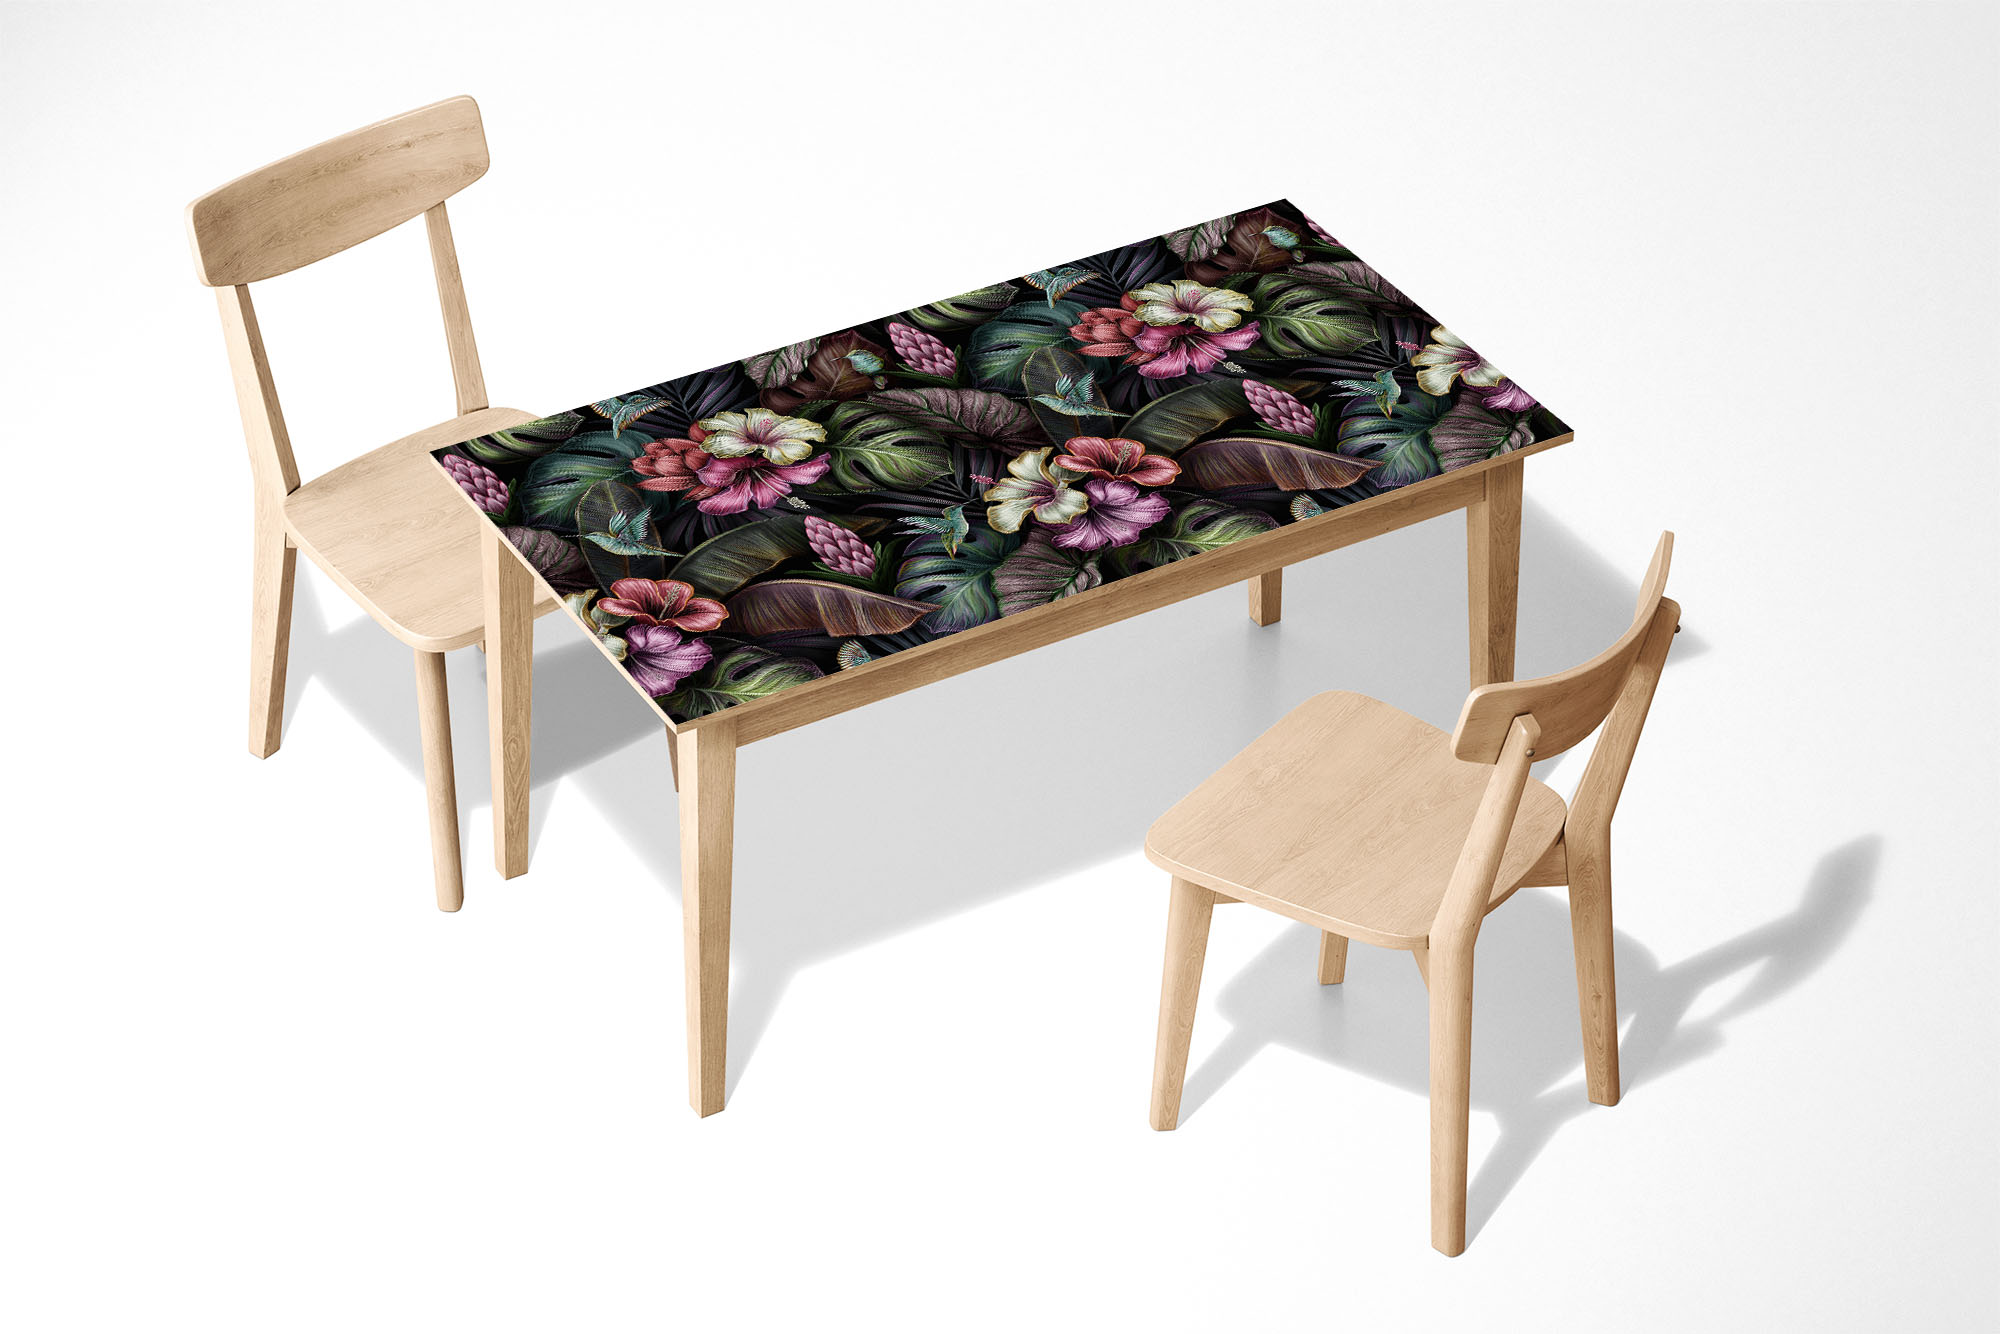 Amazing Flower Pattern Laminated Self Adhesive Vinyl Table Desk Art Décor Cover